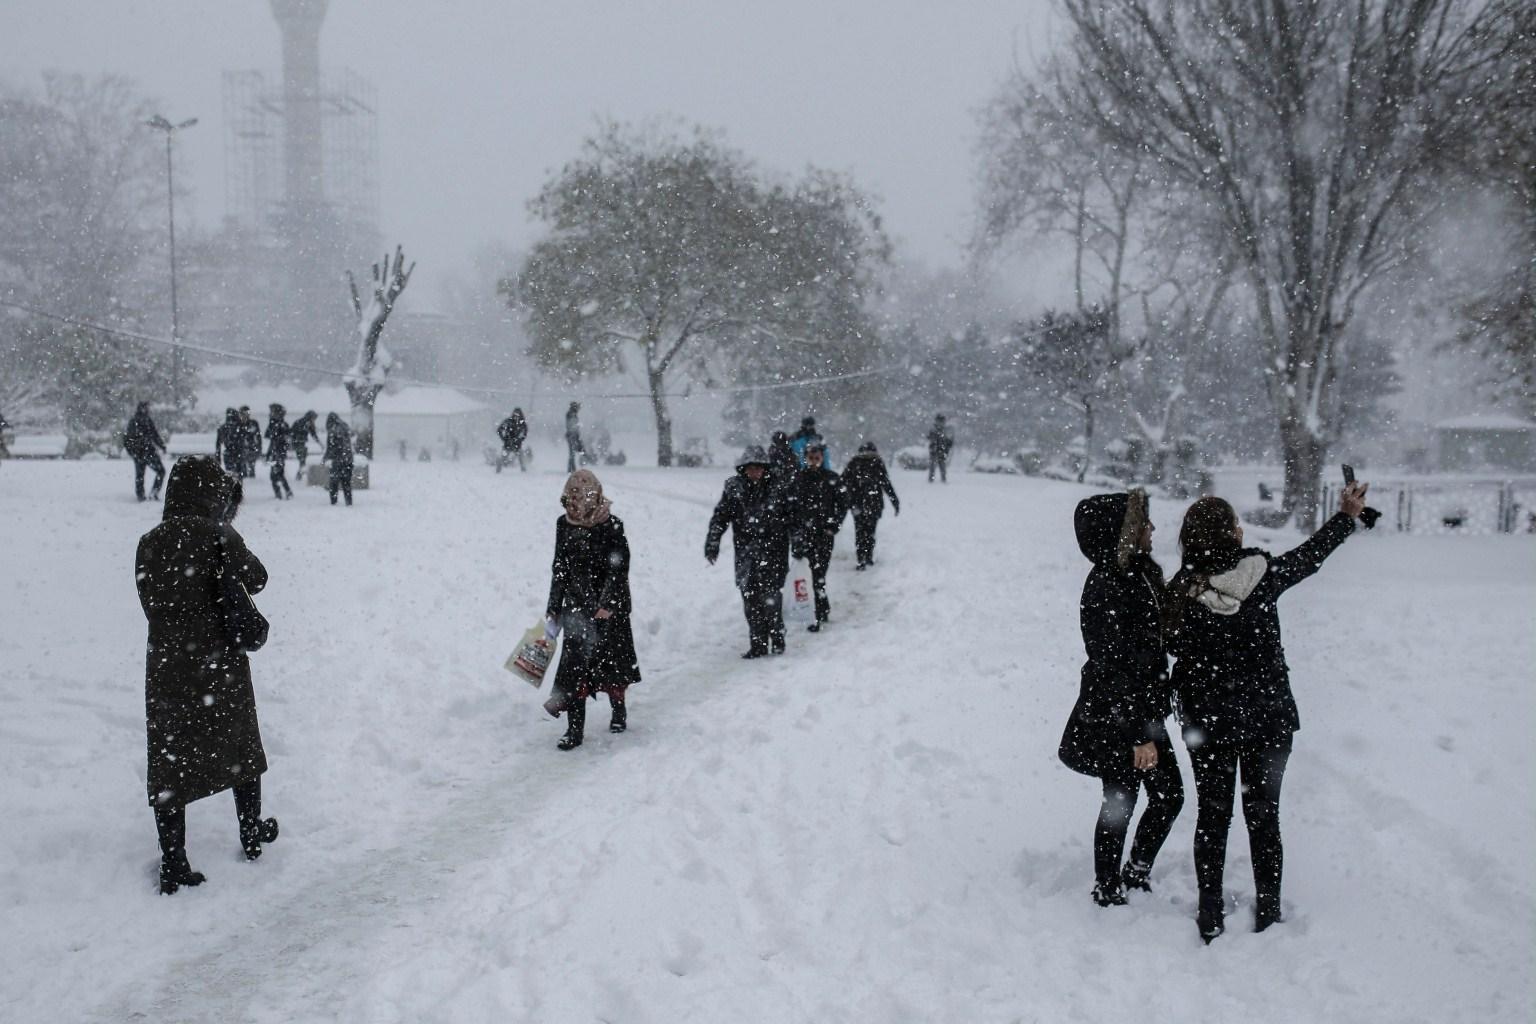 Istanbul-borna tar sig i dag vintriga promenader. Foto: AFP / YASIN AKGUL - LEHTIKUVA / AFP